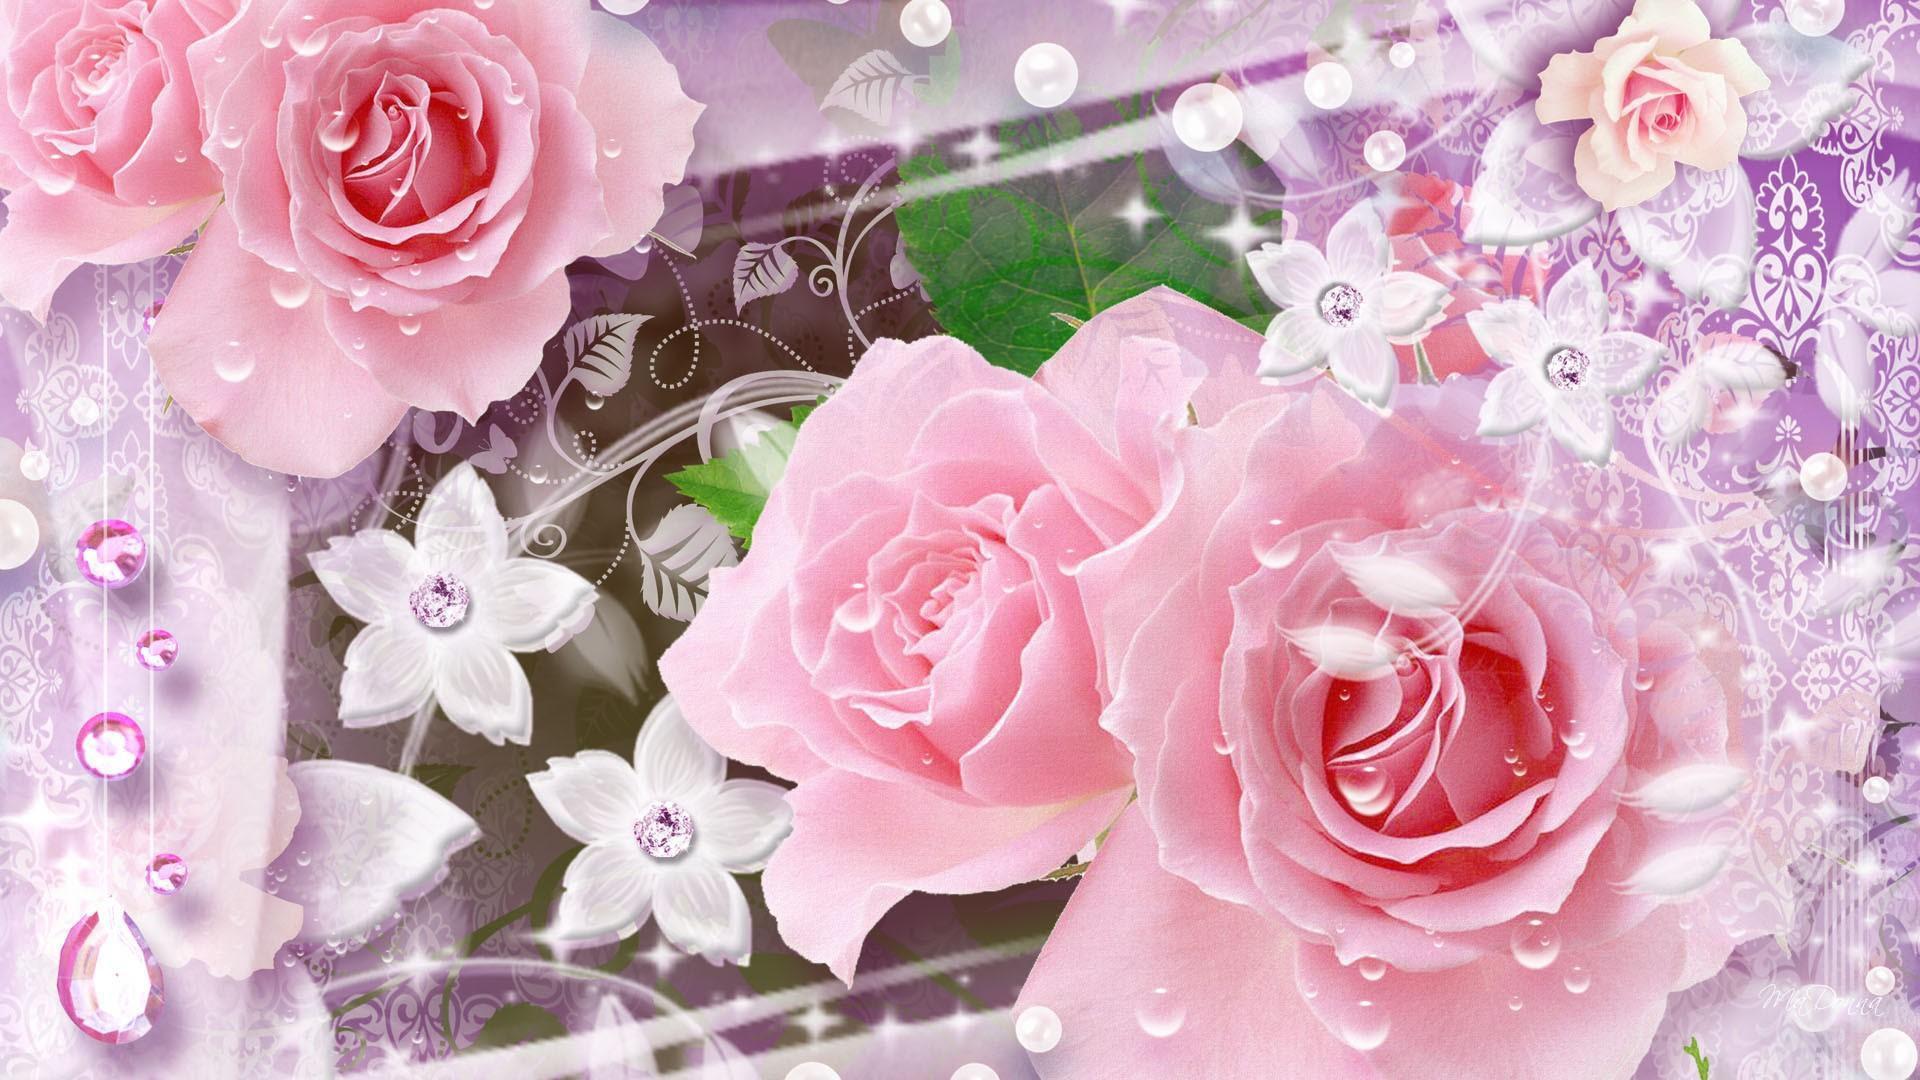 Gambar Bunga Full Layar Gambar Bunga